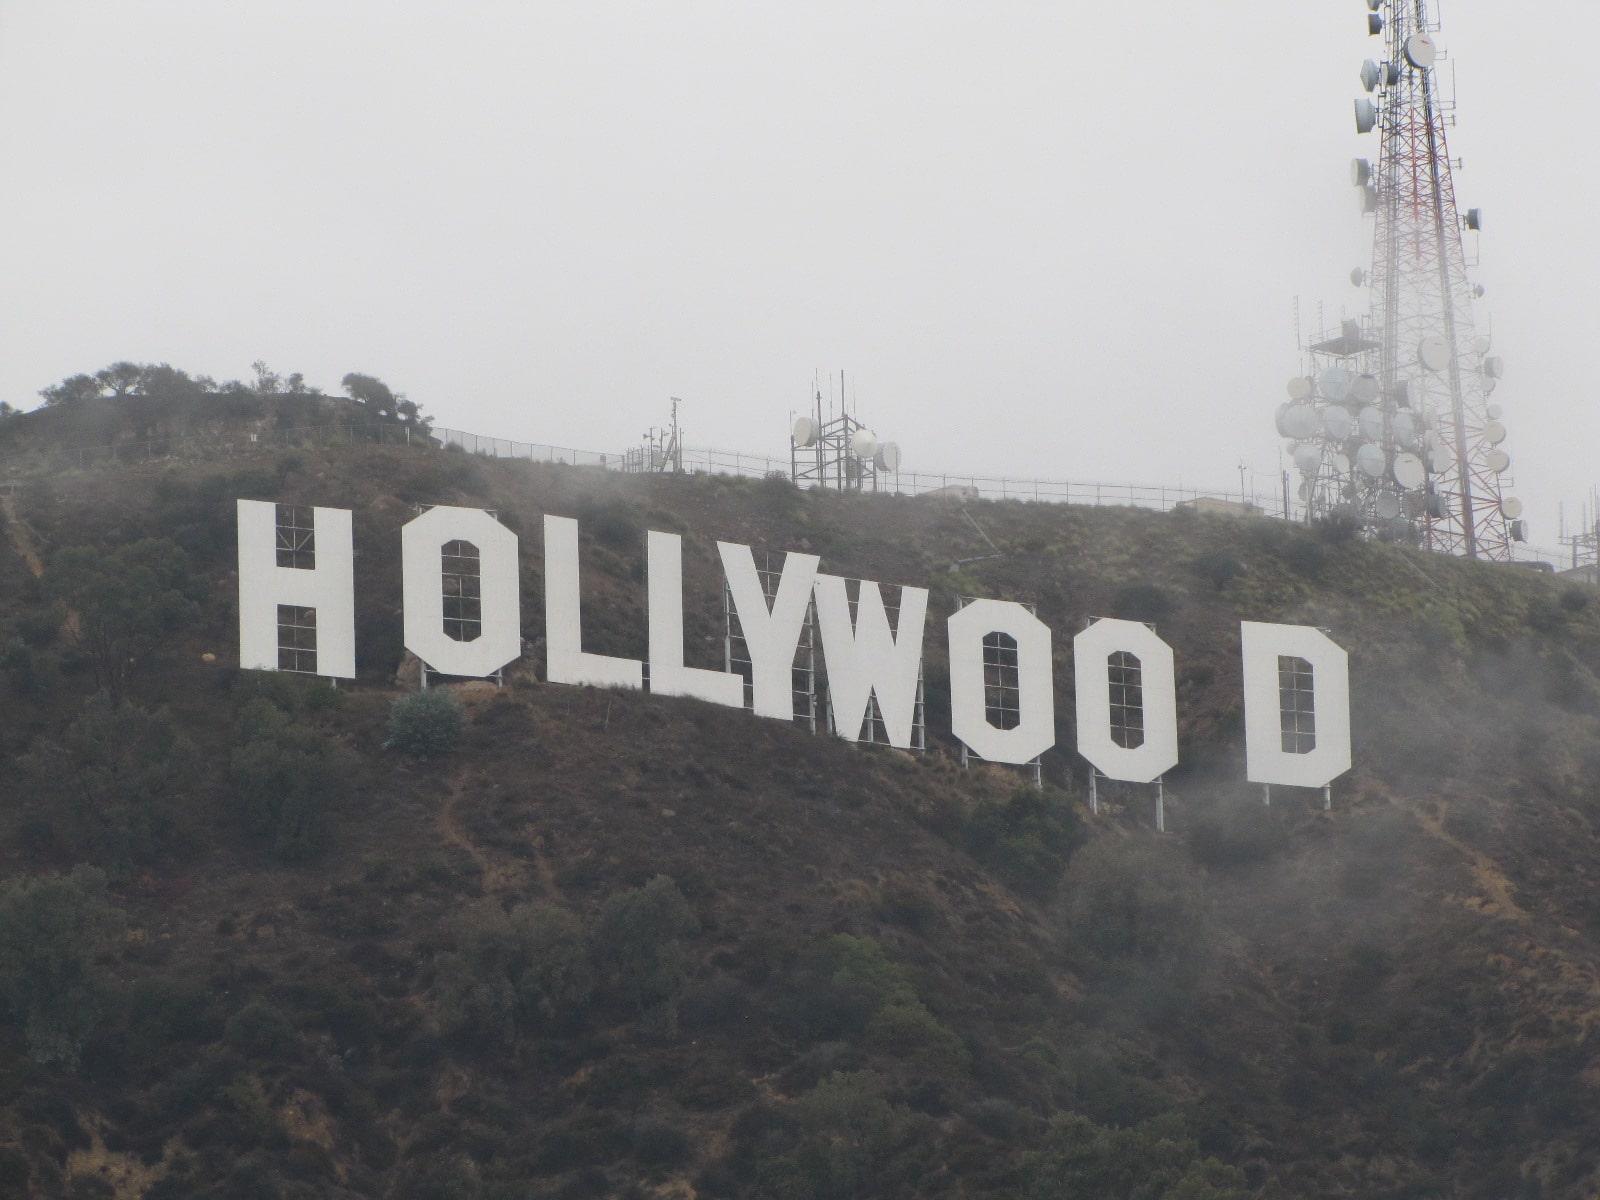 Hollywood Signs ... dans les nuages